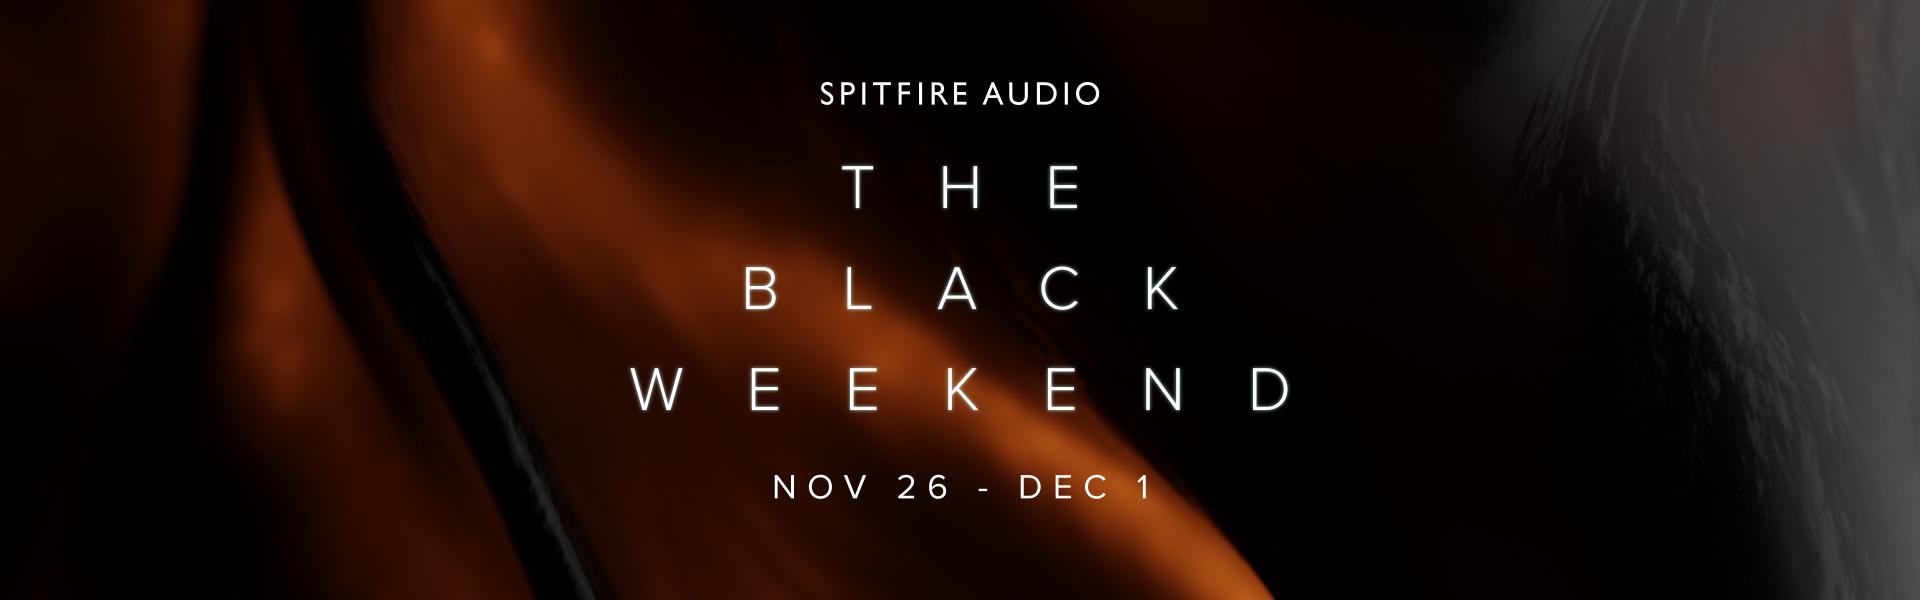 The Black Weekend Banner